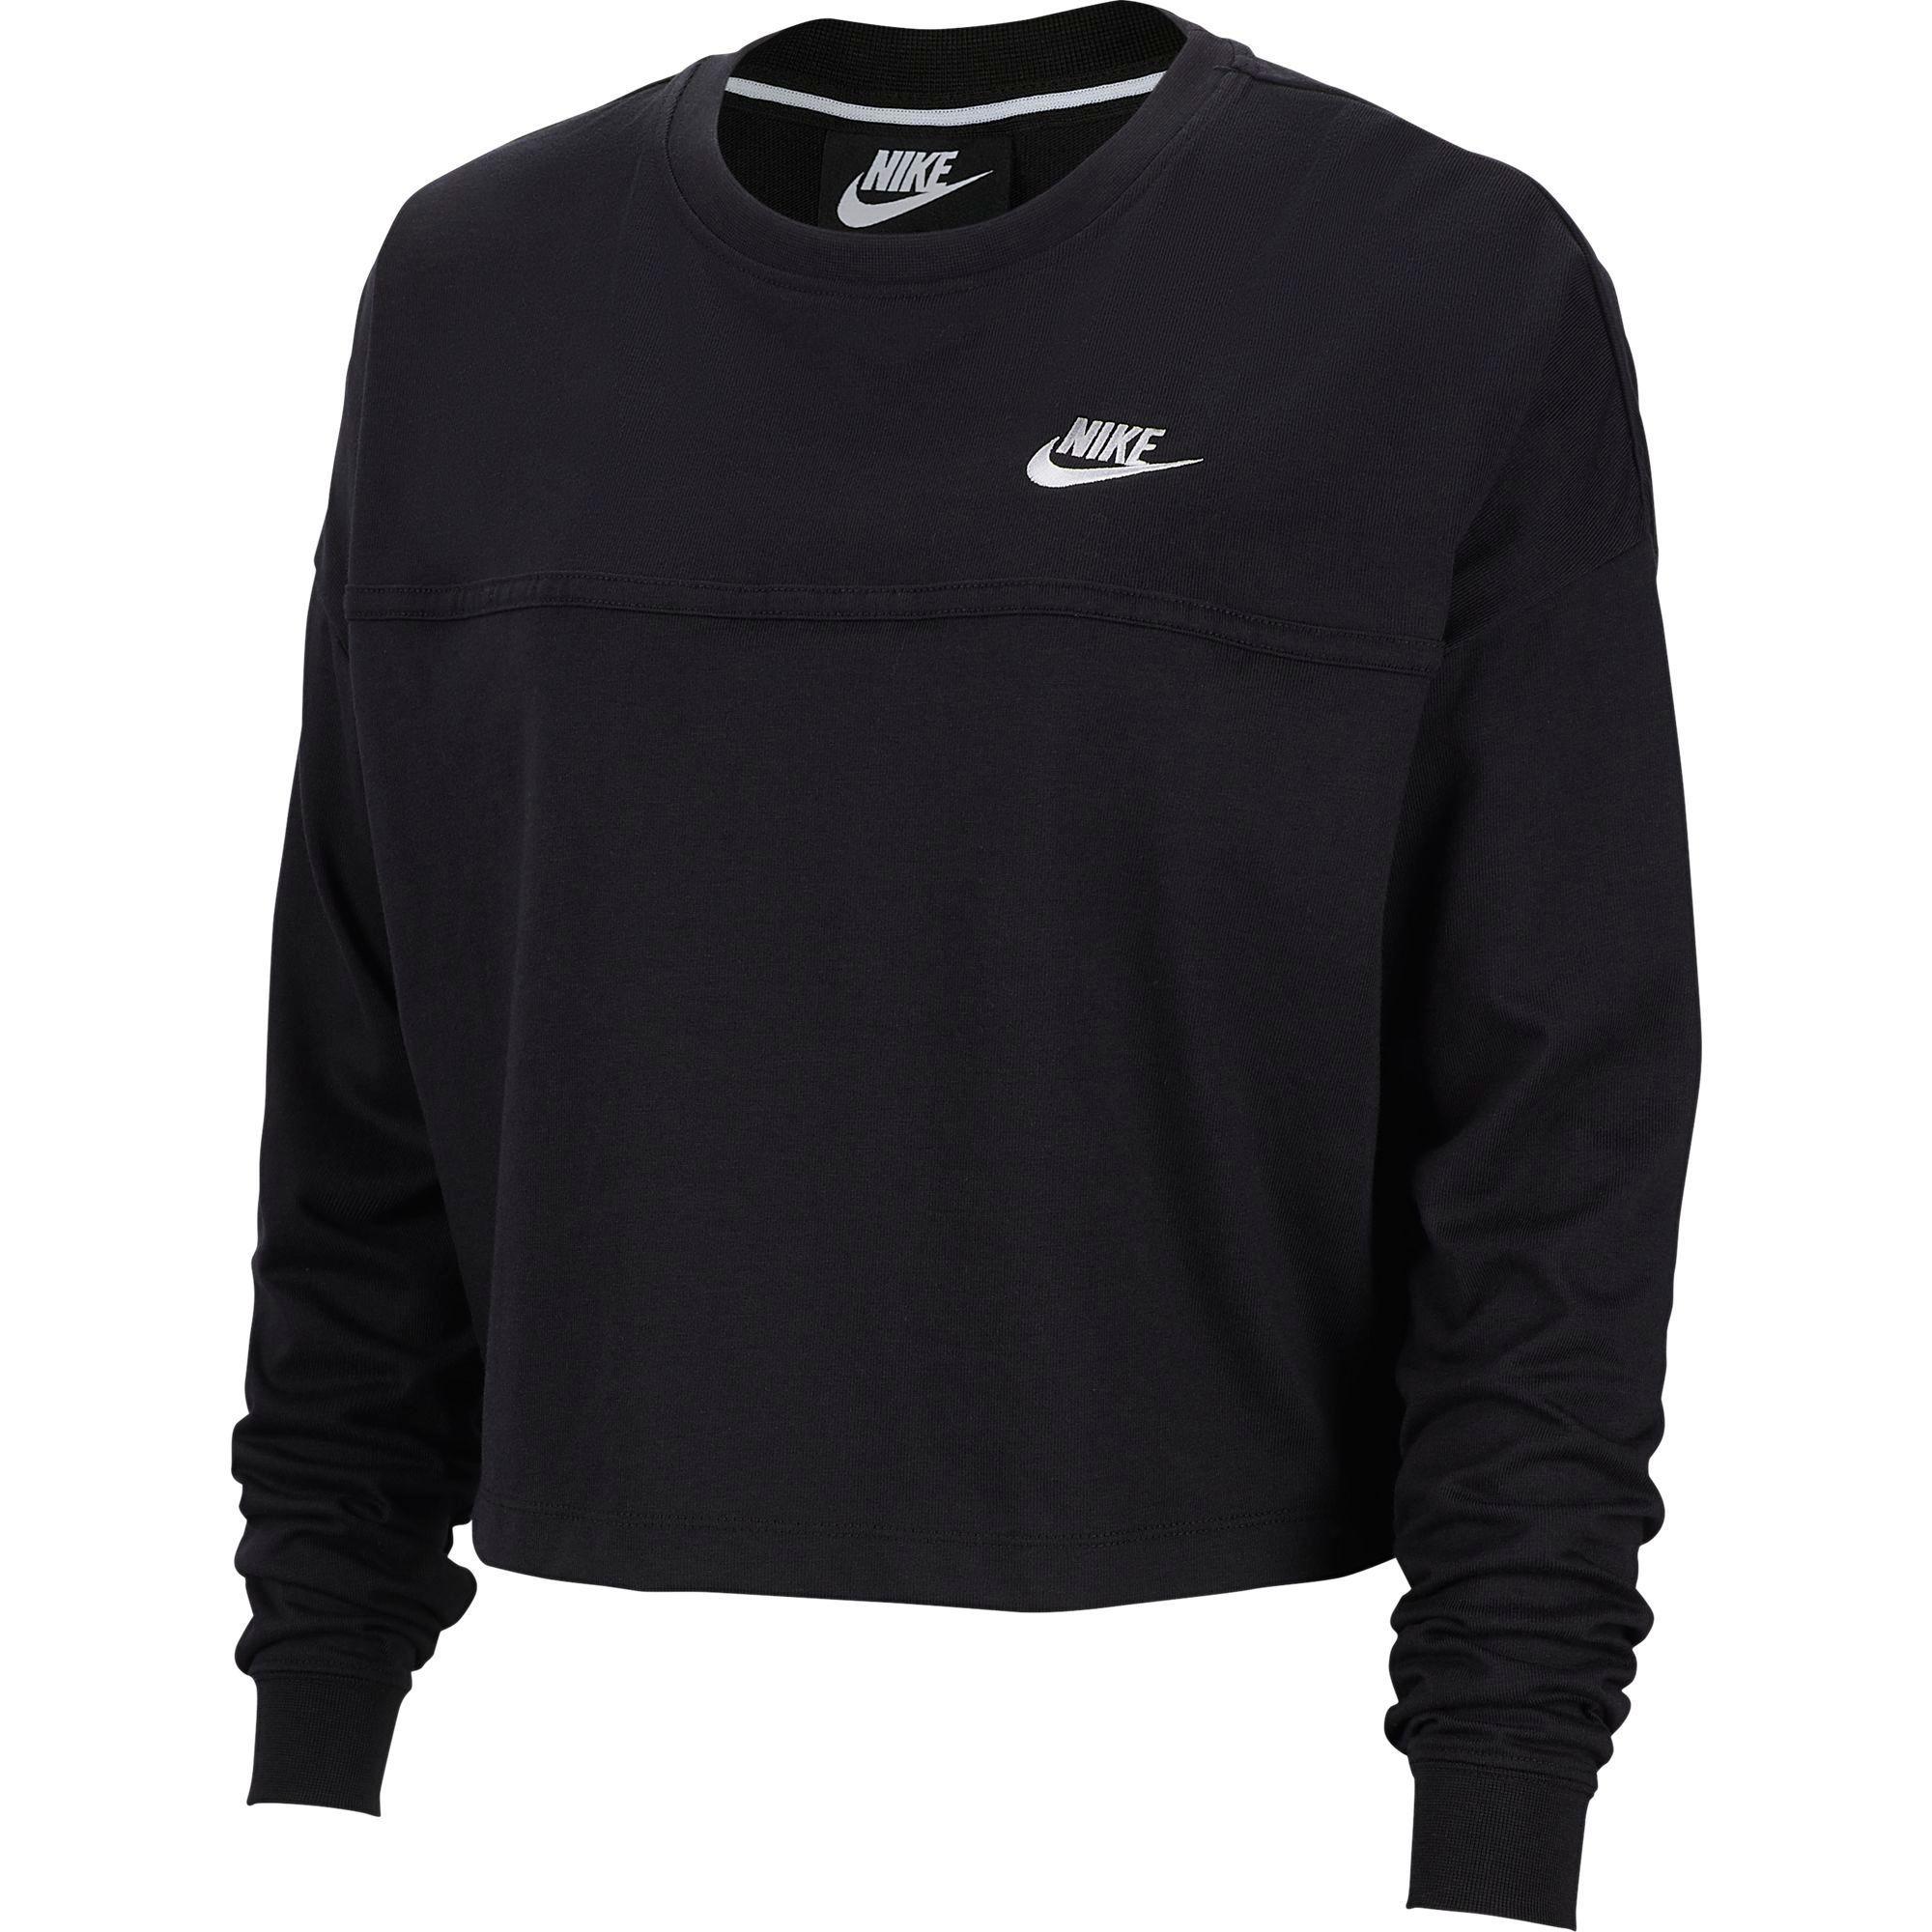 Nike Nike Women's Sportswear Rally Crew Sweatshirt, Size: XS, Black from DICKS Sporting Goods | ShapeShop